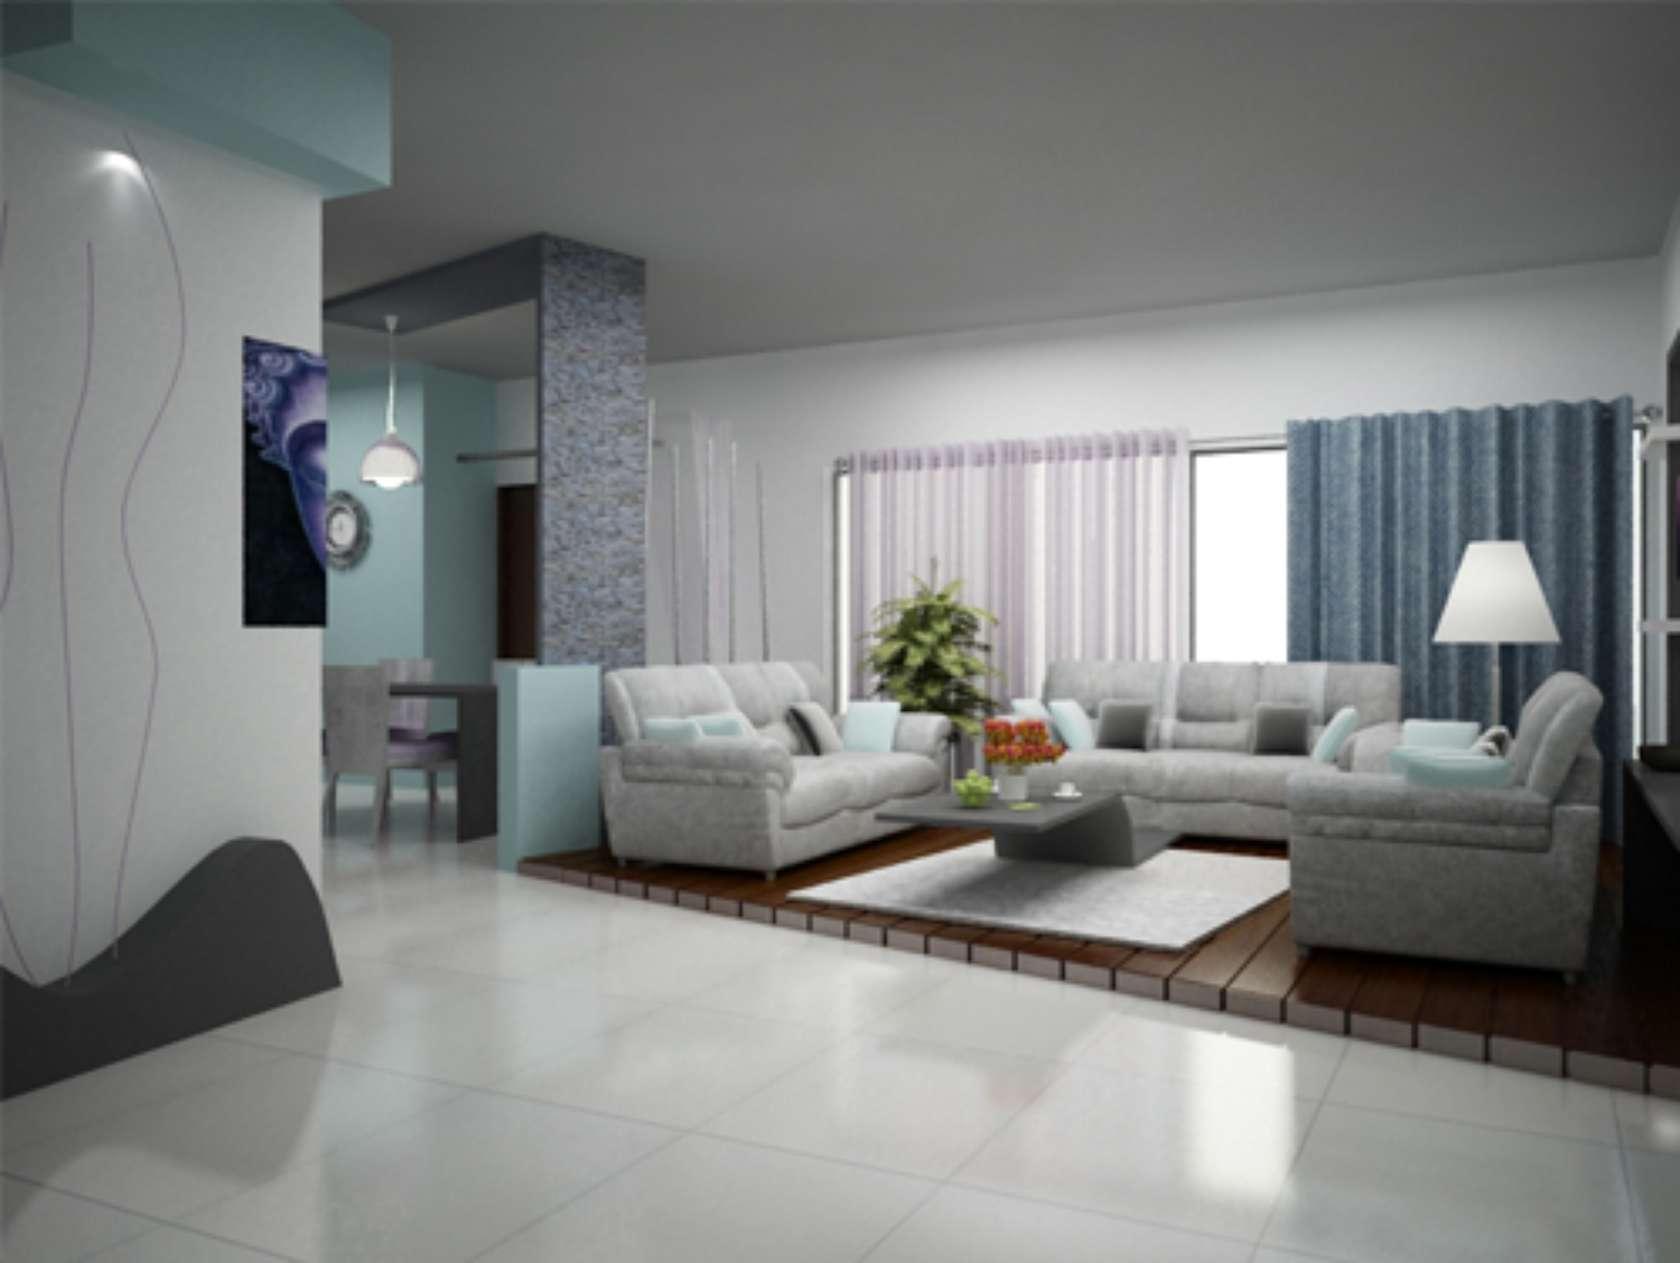 Jyothi S Beautiful Home Interior Design In Bangalore